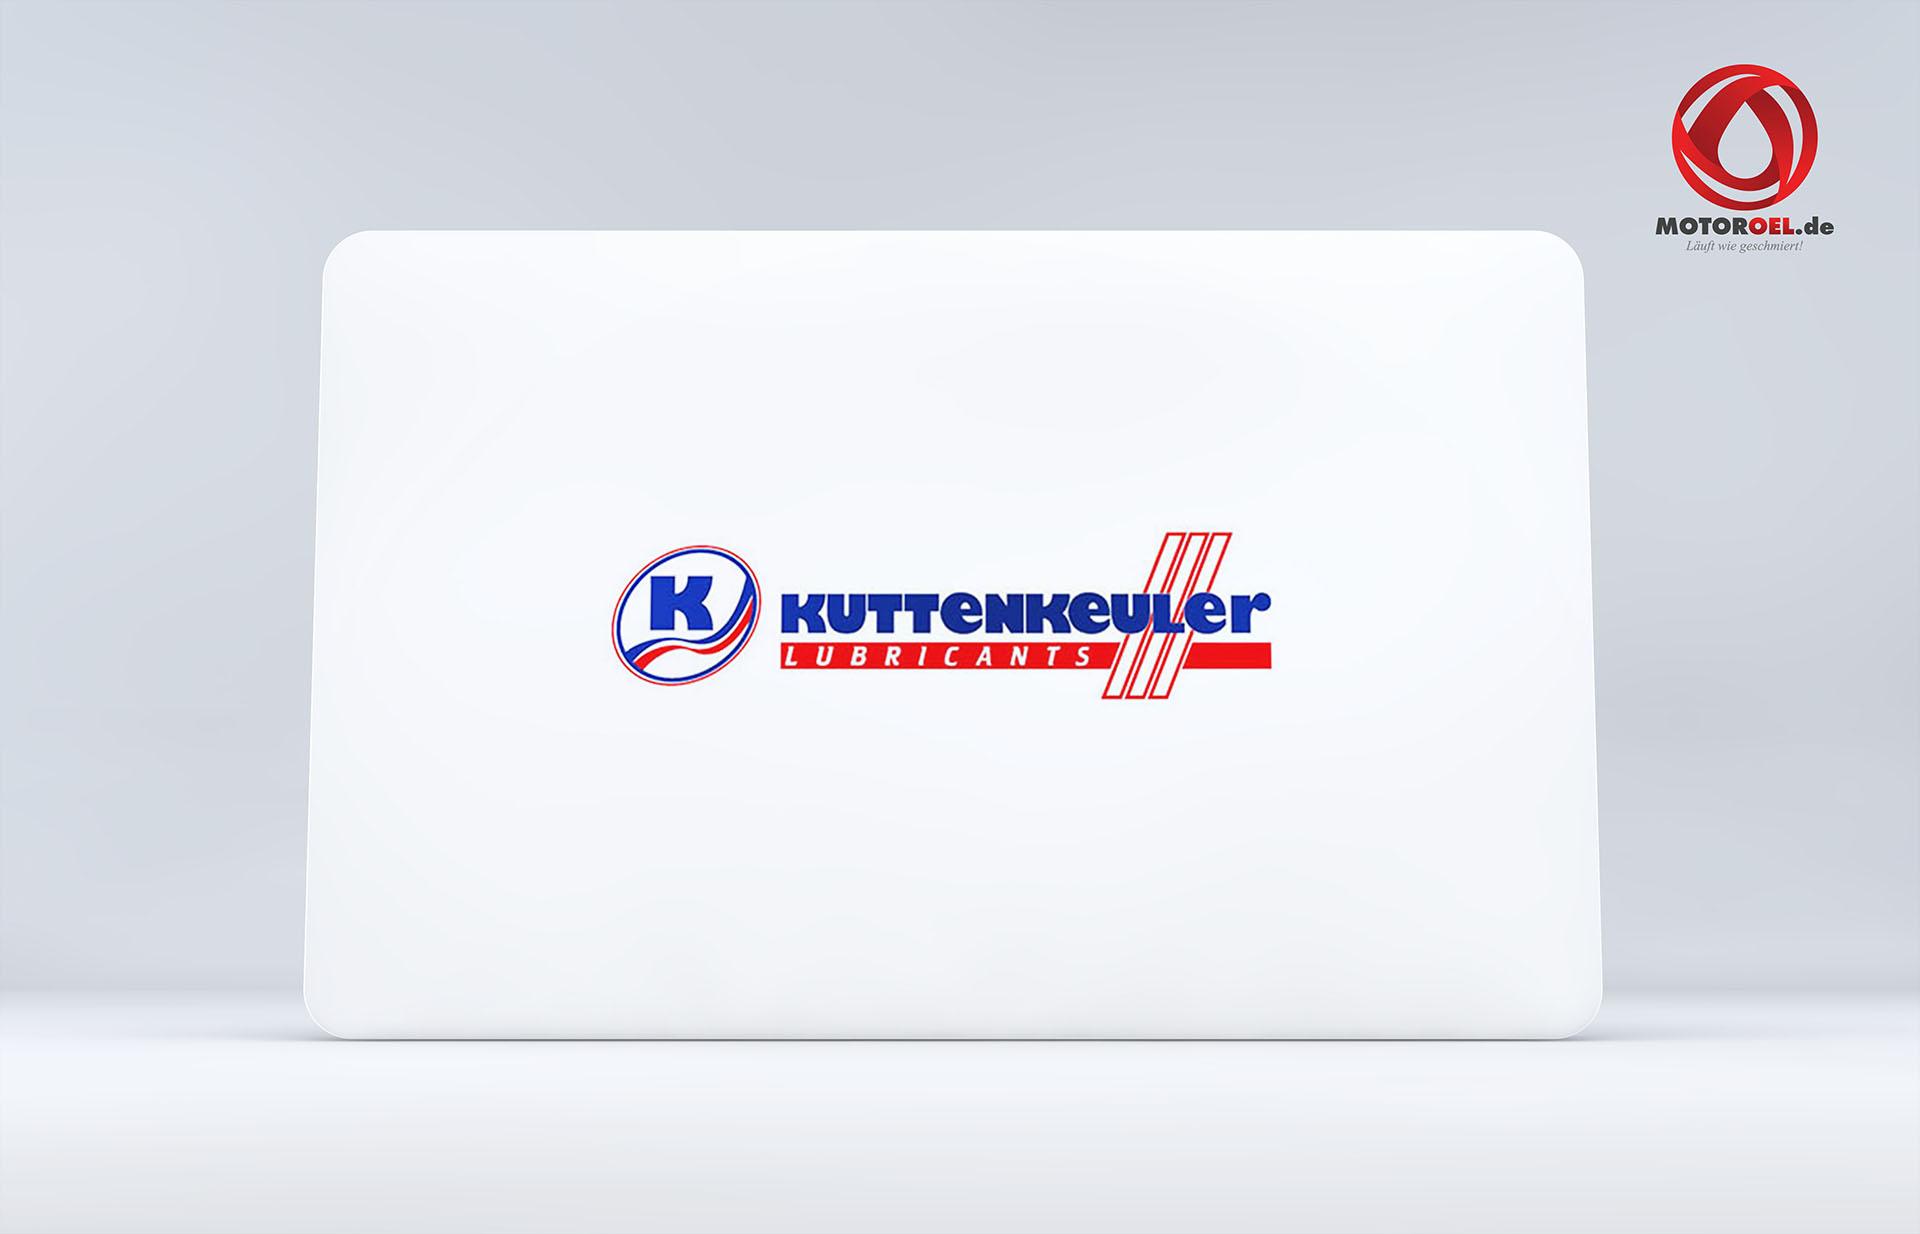 Kuttenkeuler Motoröl Hersteller 5w30